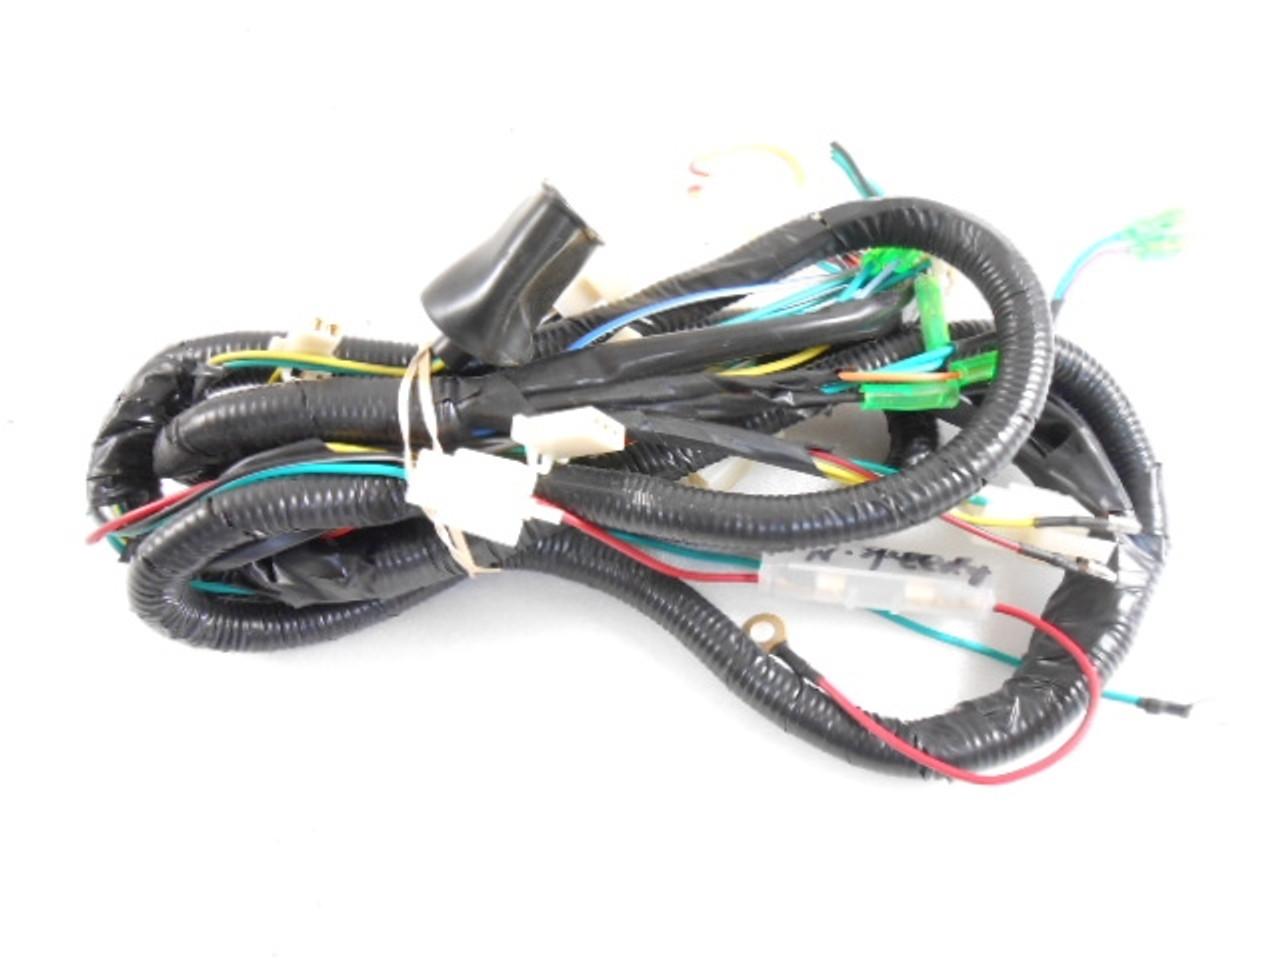 wire harness /wireharness 11319-a74-5